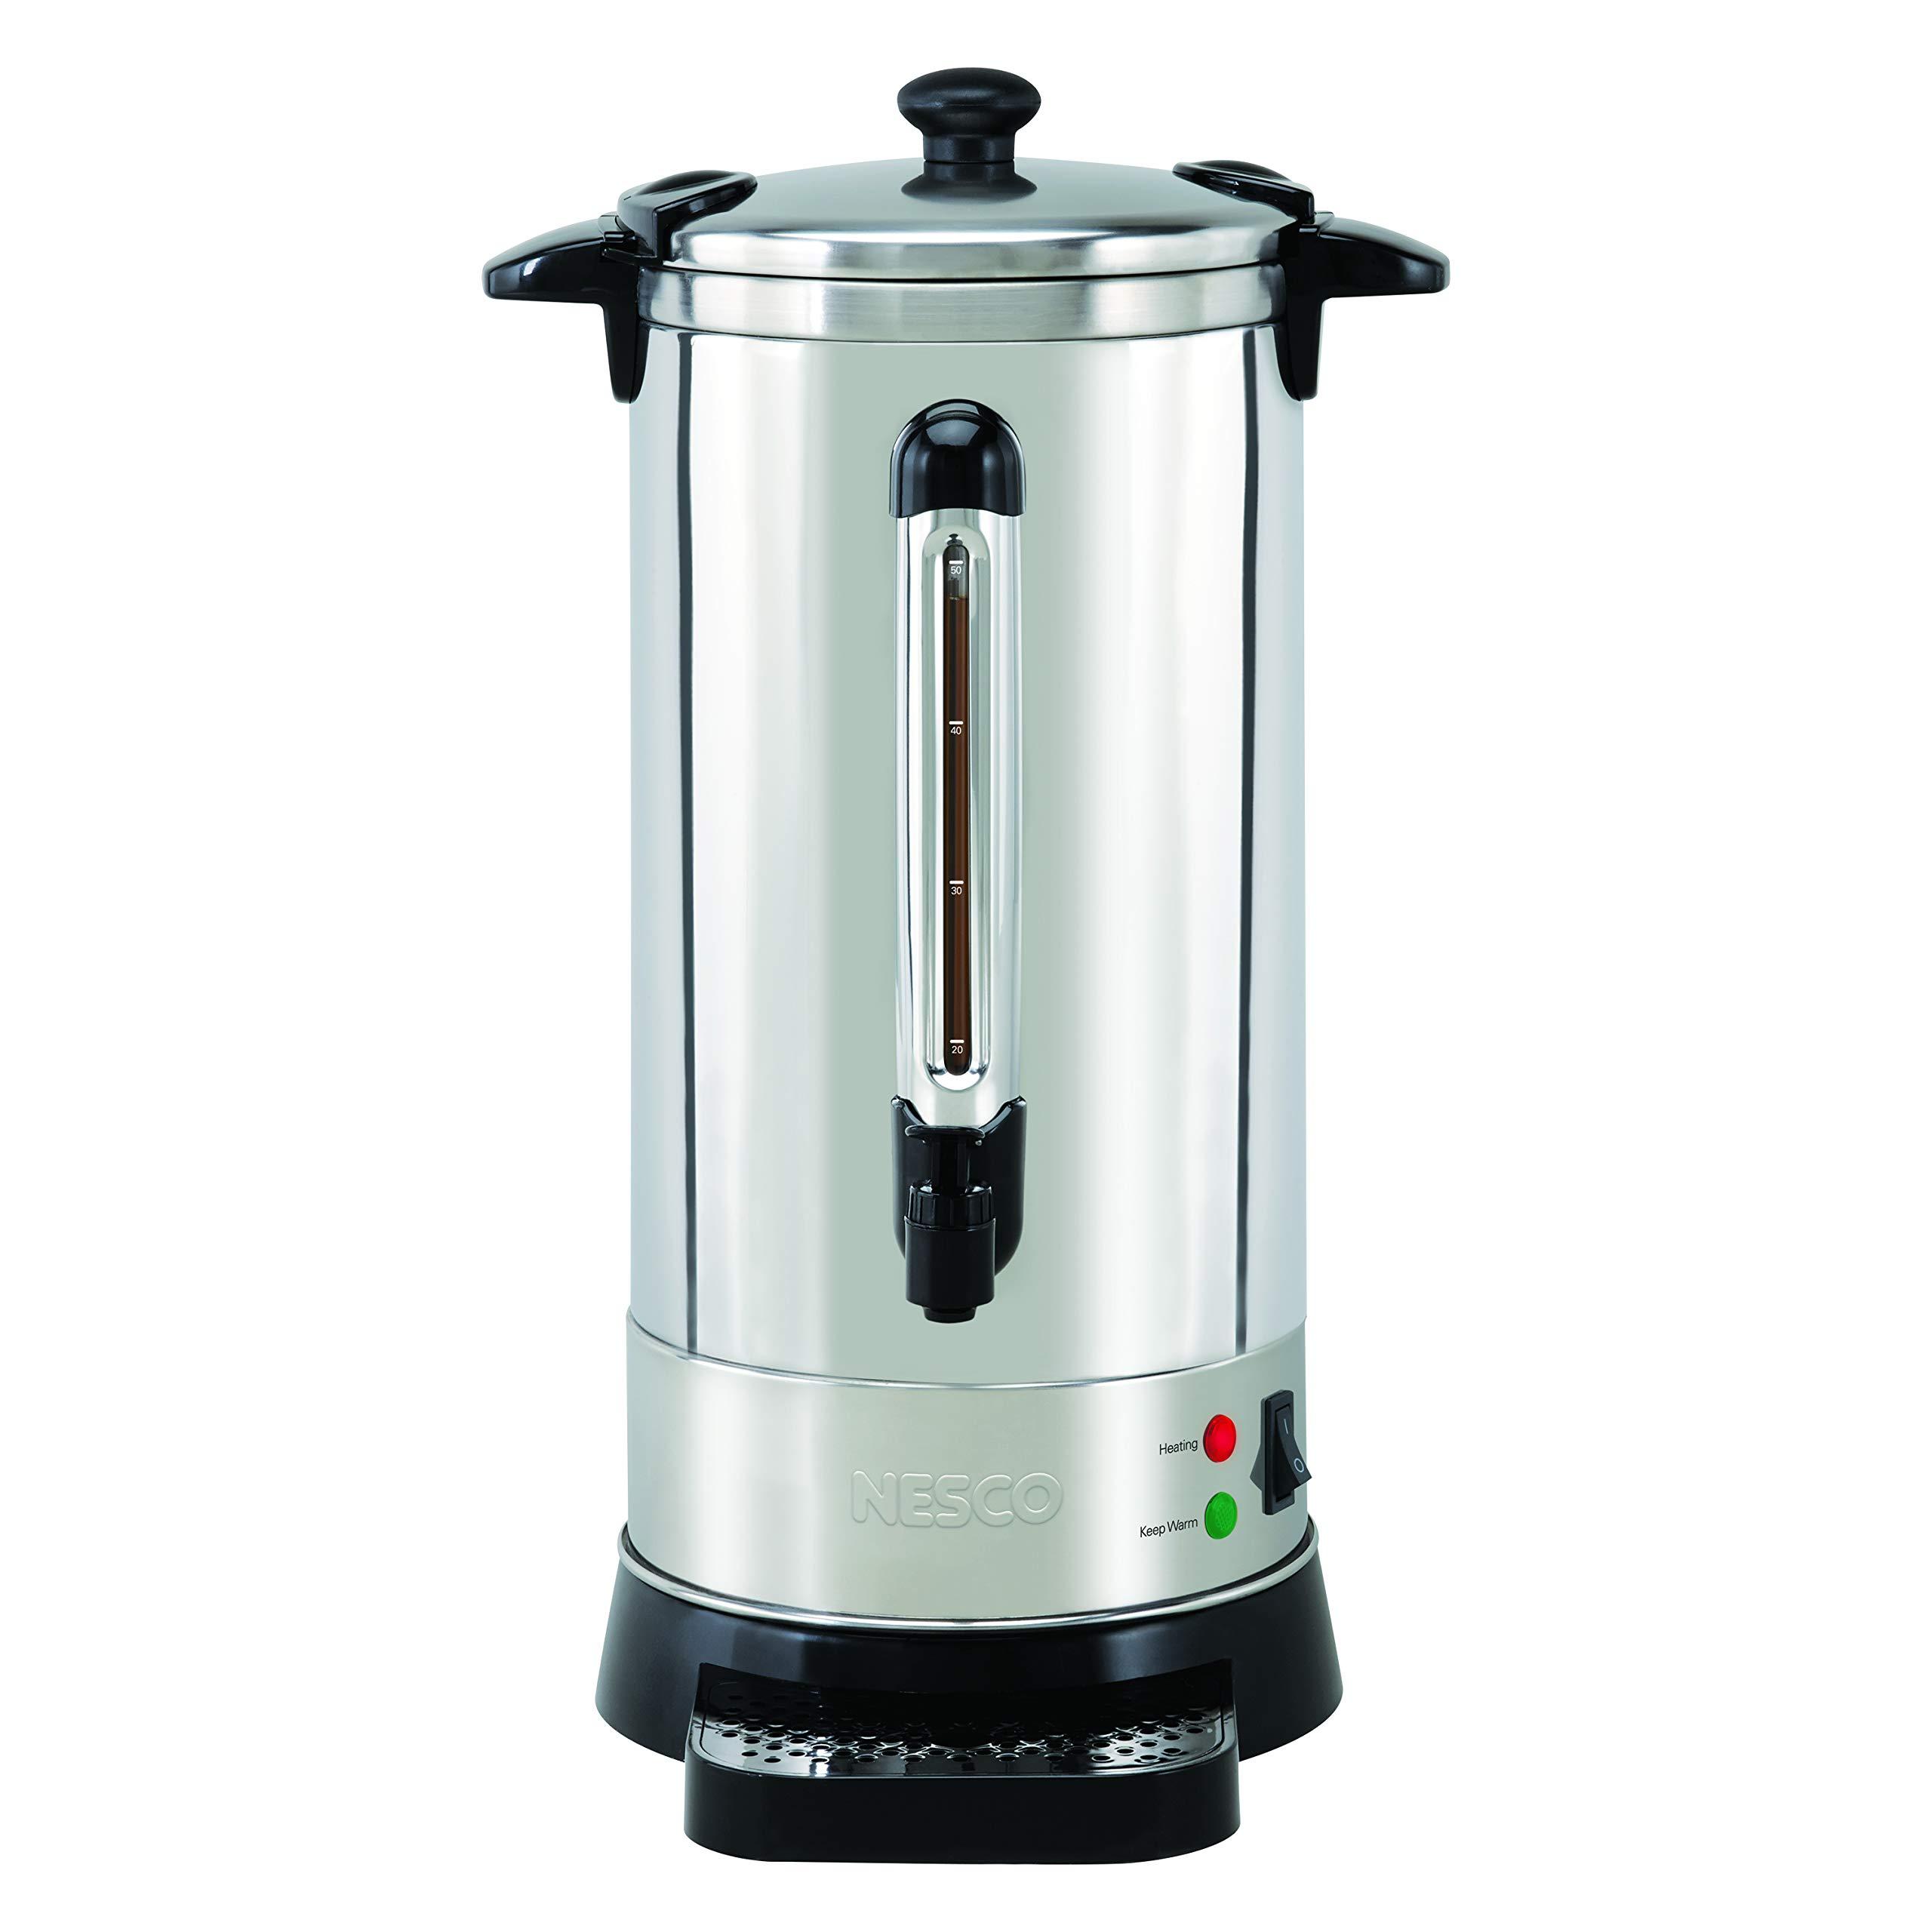 NESCO CU-50, Professional Coffee Urn, 50 Cups, Stainless Steel by Nesco